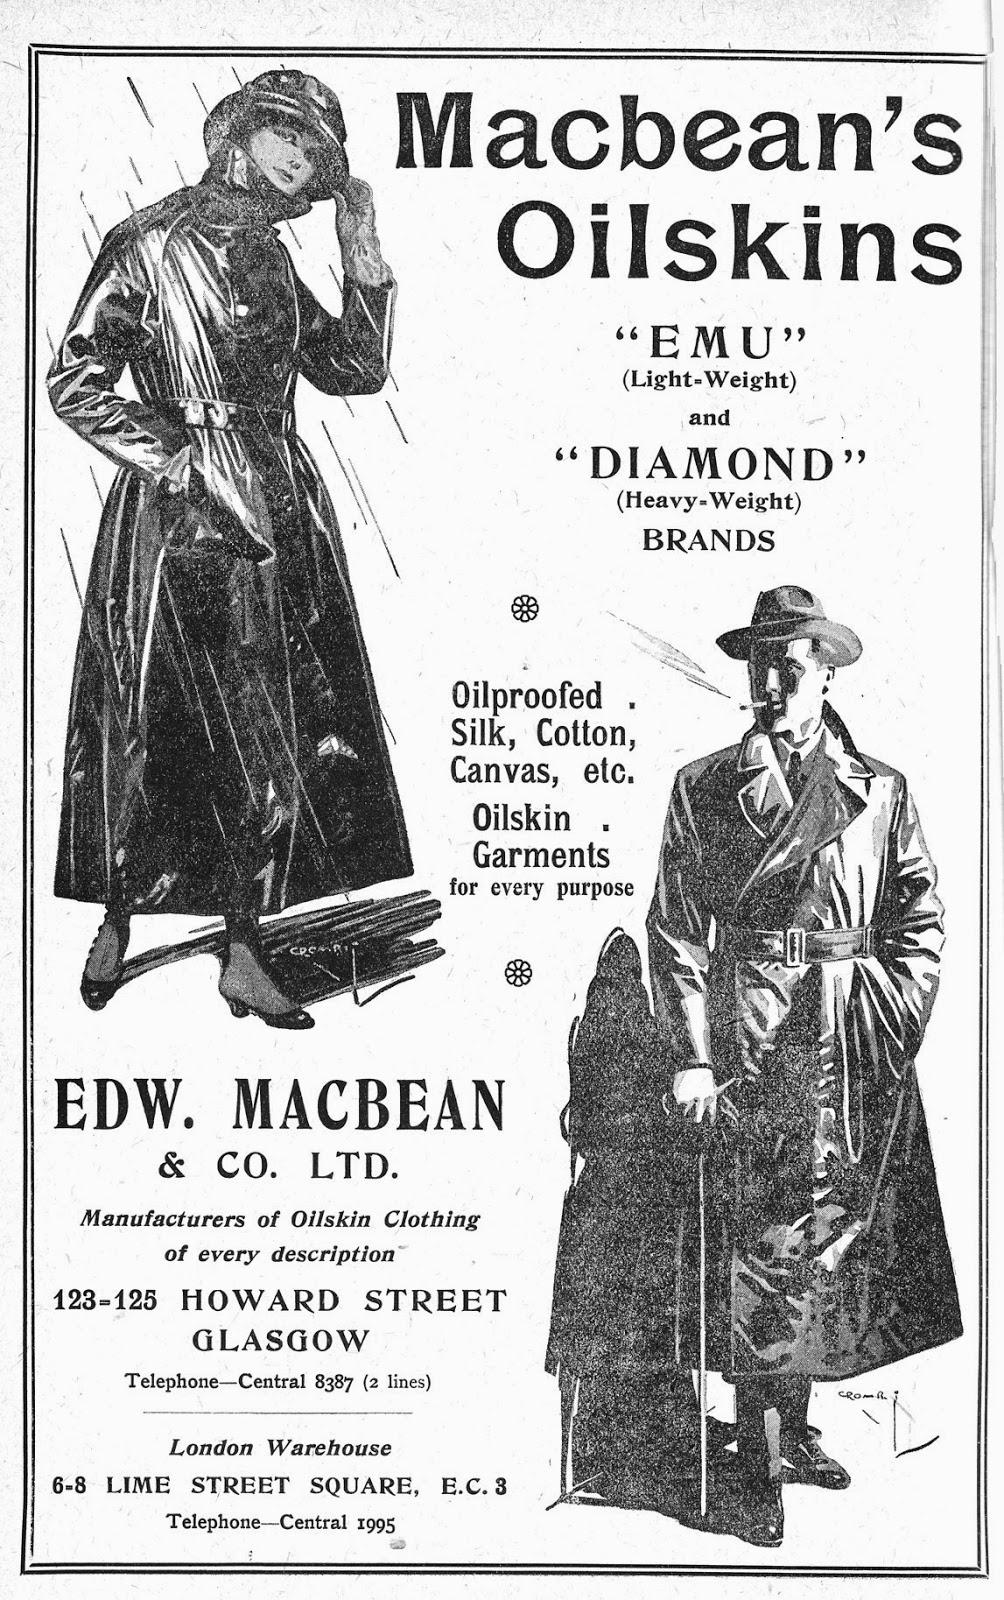 Edward Macbean & Co. Ltd., Glasgow